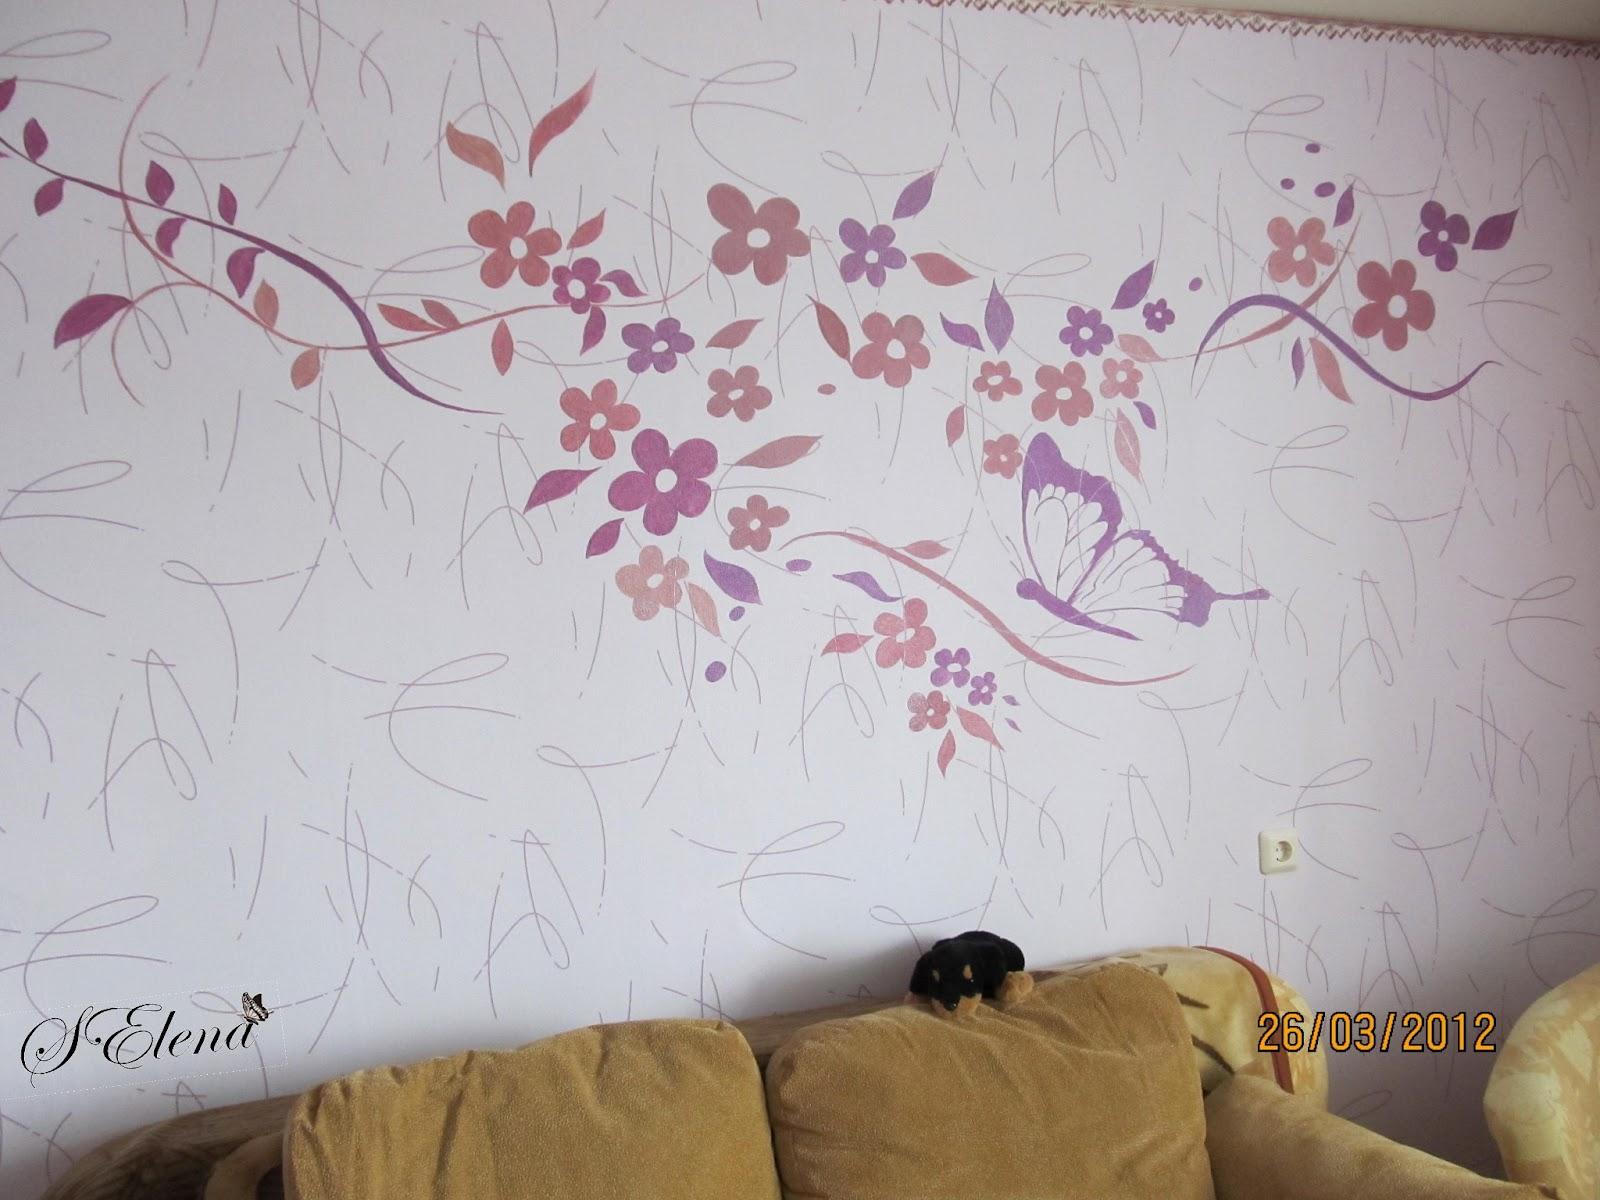 Трафареты рисунков на стенах в квартире своими руками фото